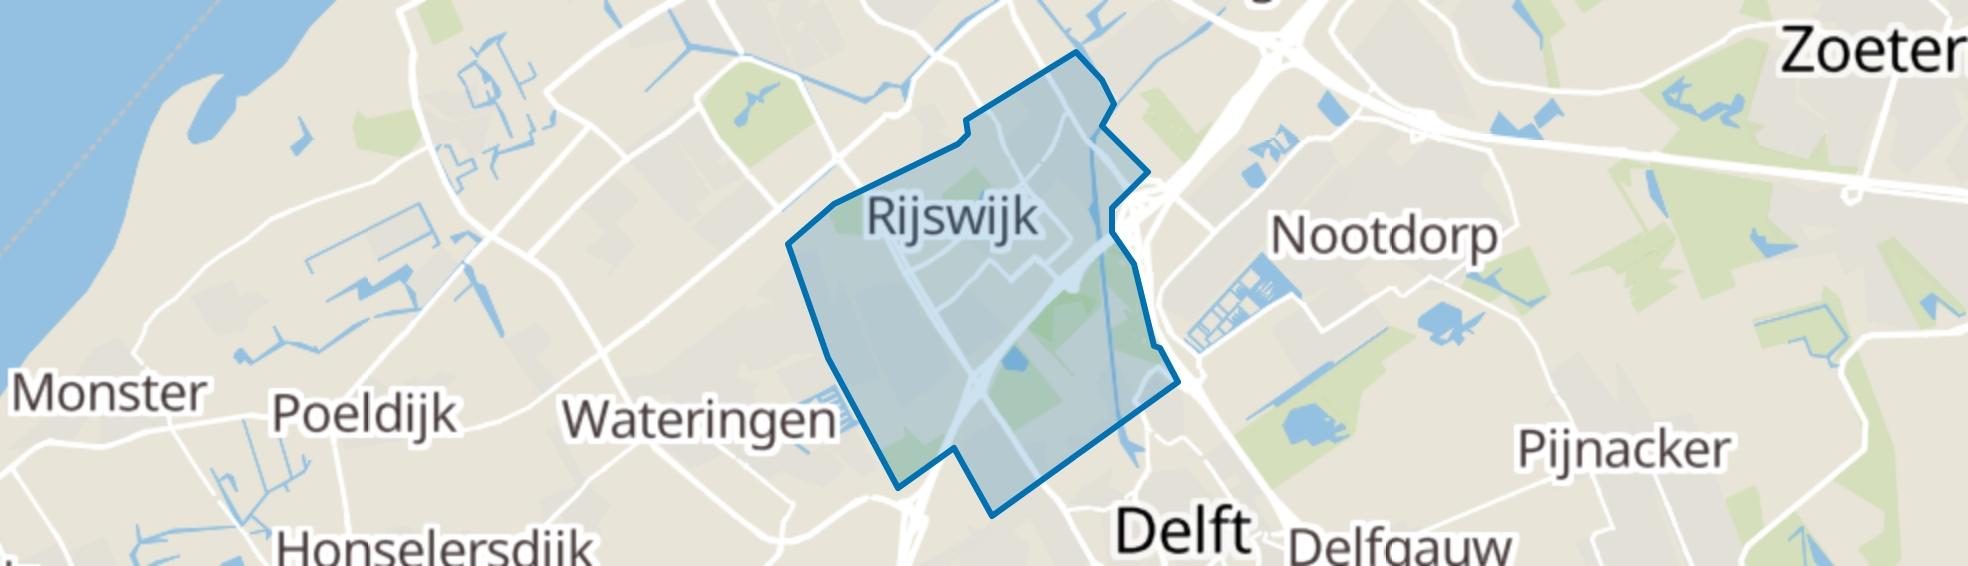 Rijswijk (ZH) map